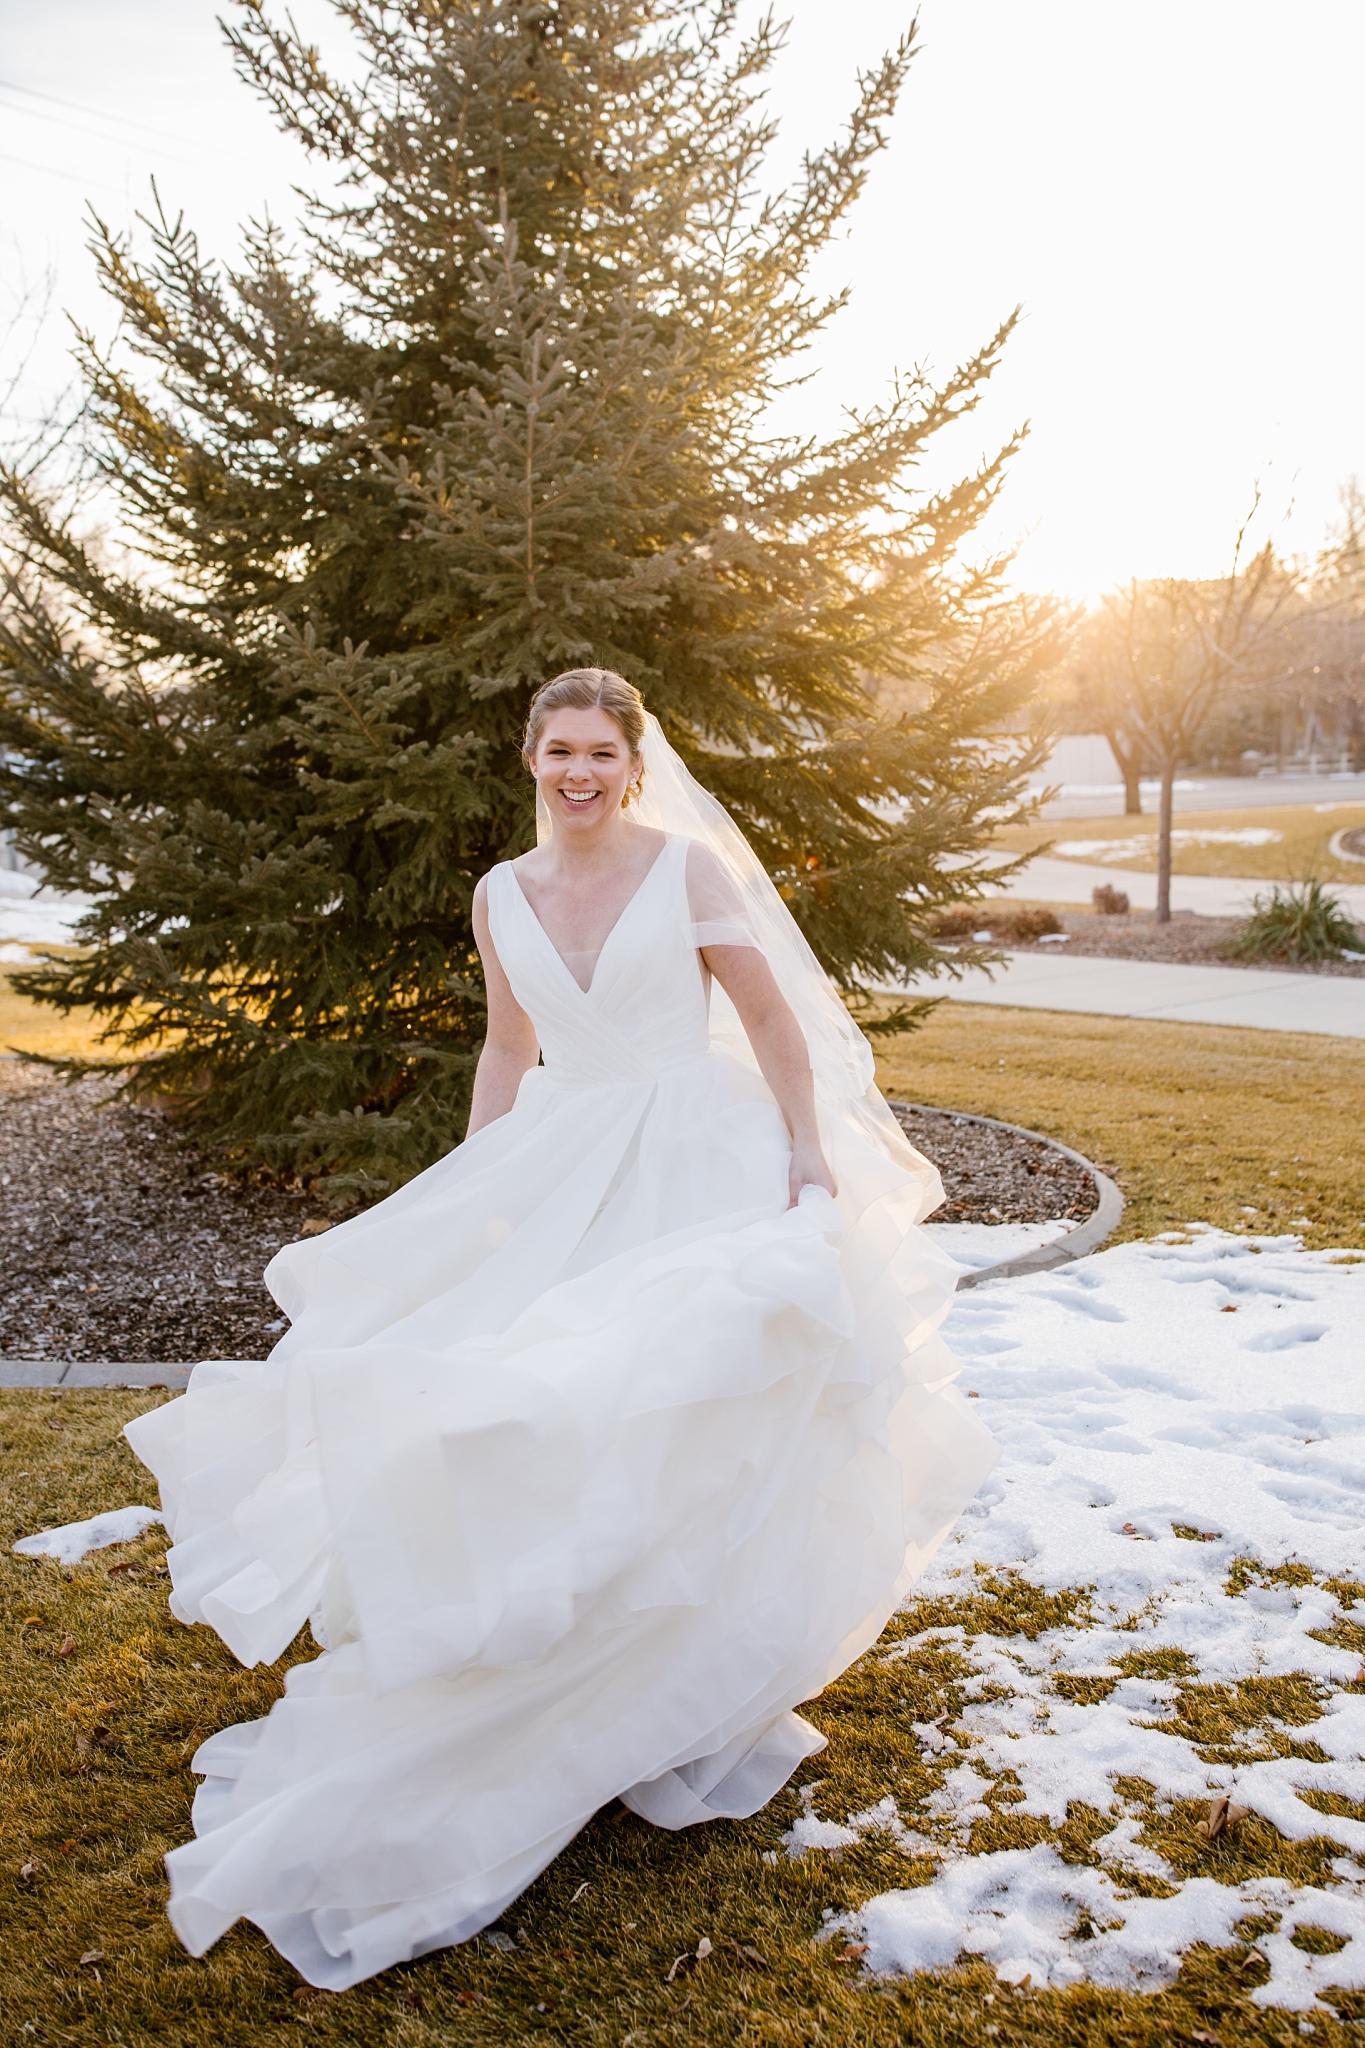 CN-Wedding-255_Lizzie-B-Imagery-Utah-Wedding-Photographer-Blessed-Sacrament-Catholic-Church-Sandy-Utah-The-Blended-Table-Salt-Lake-City.jpg